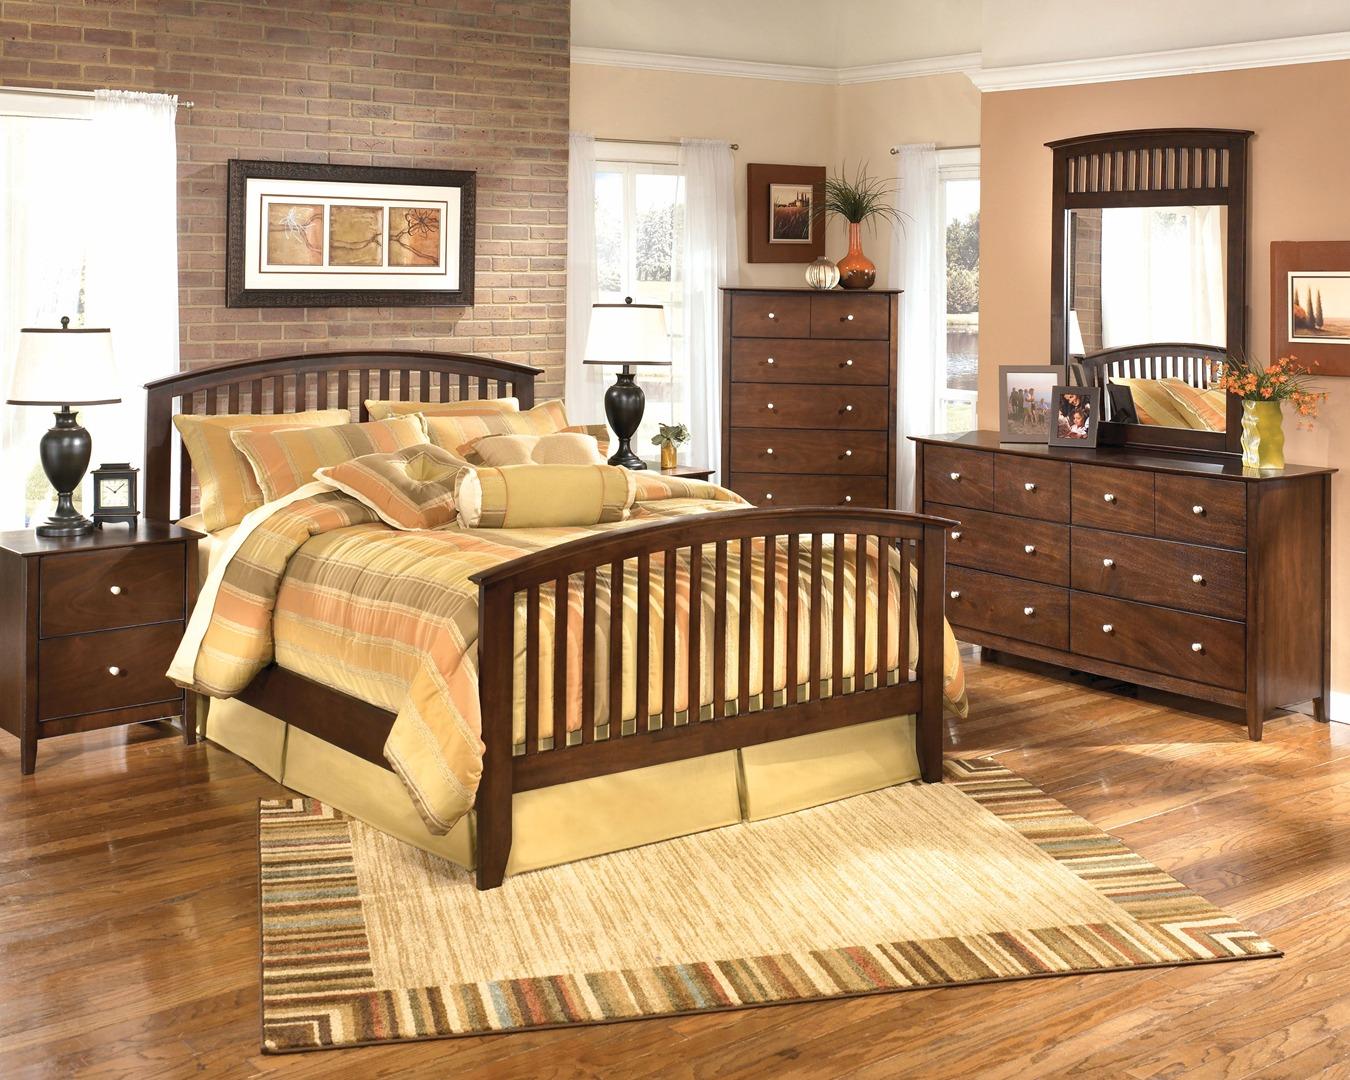 Metro Bedroom Furniture Home